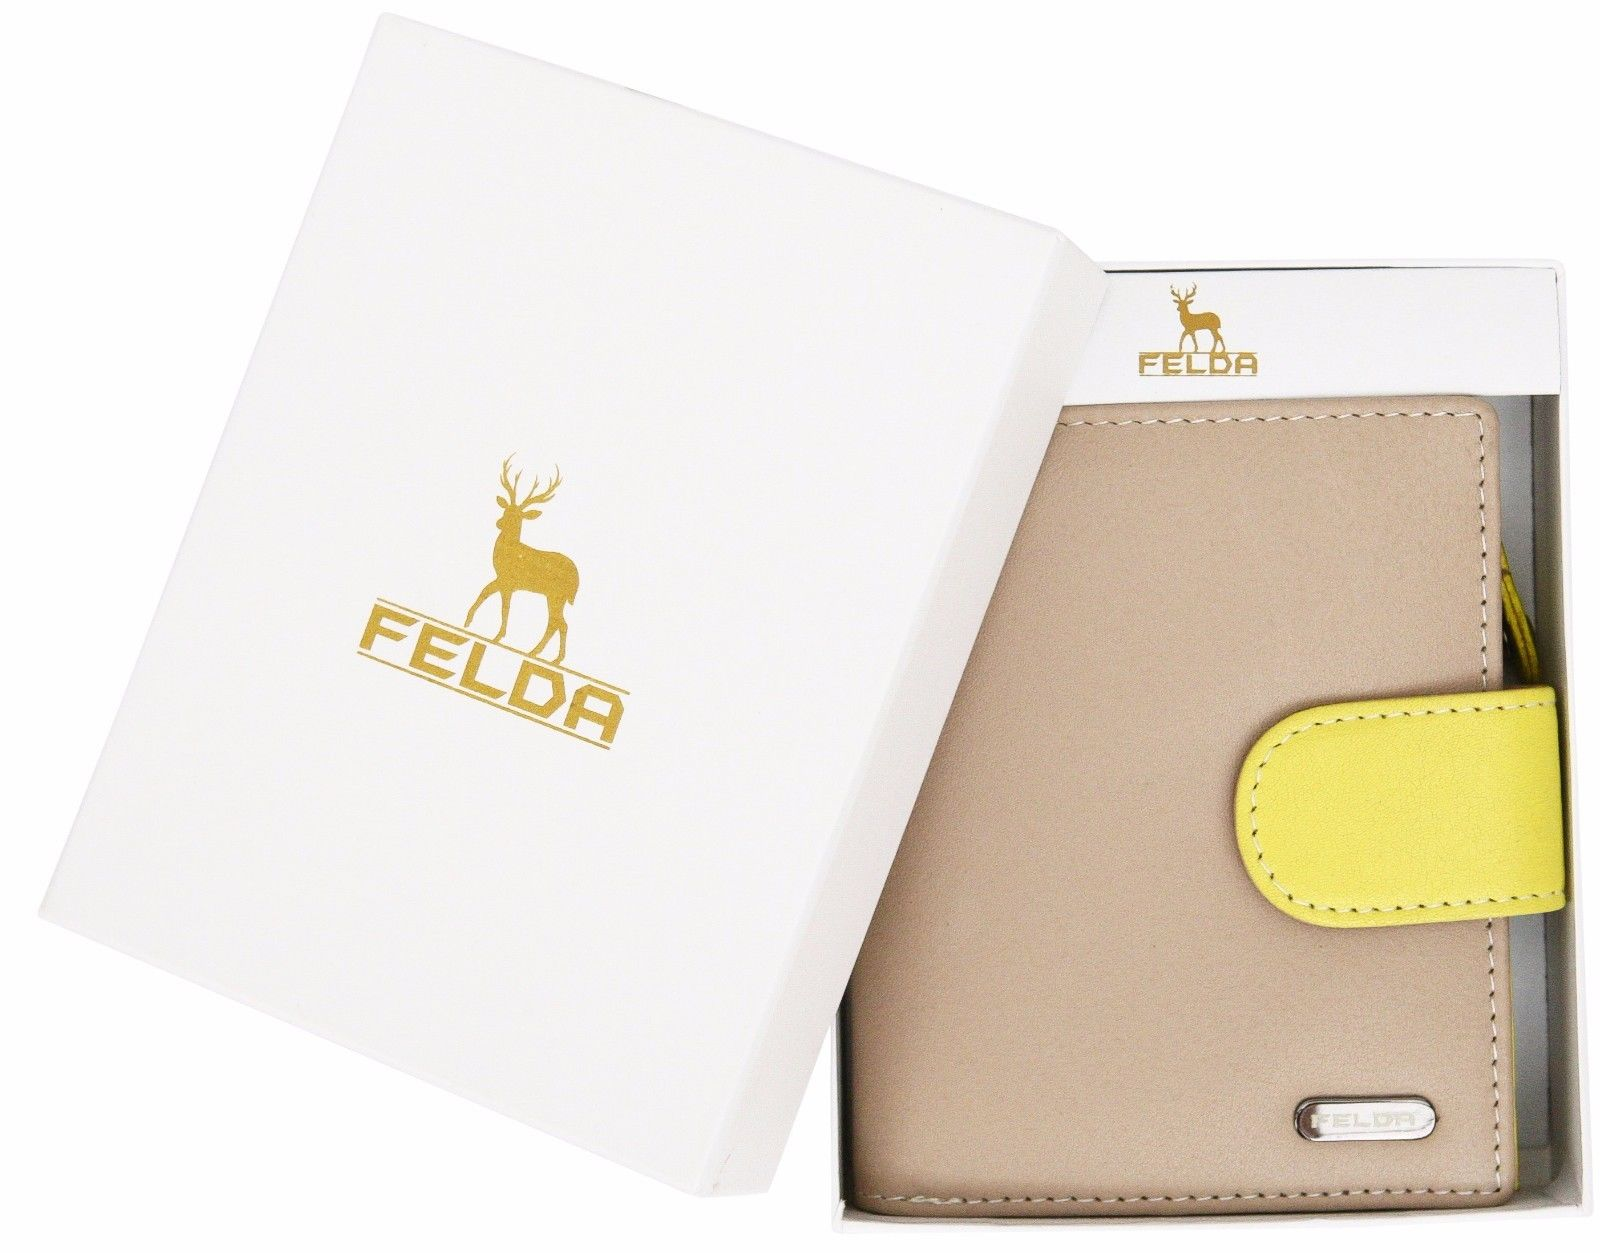 Felda-RFID-onorevoli-MEDAGLIA-amp-Card-Purse-Wallet-Genuine-Leather-Multi-SOFT-BOX-REGALO miniatura 61